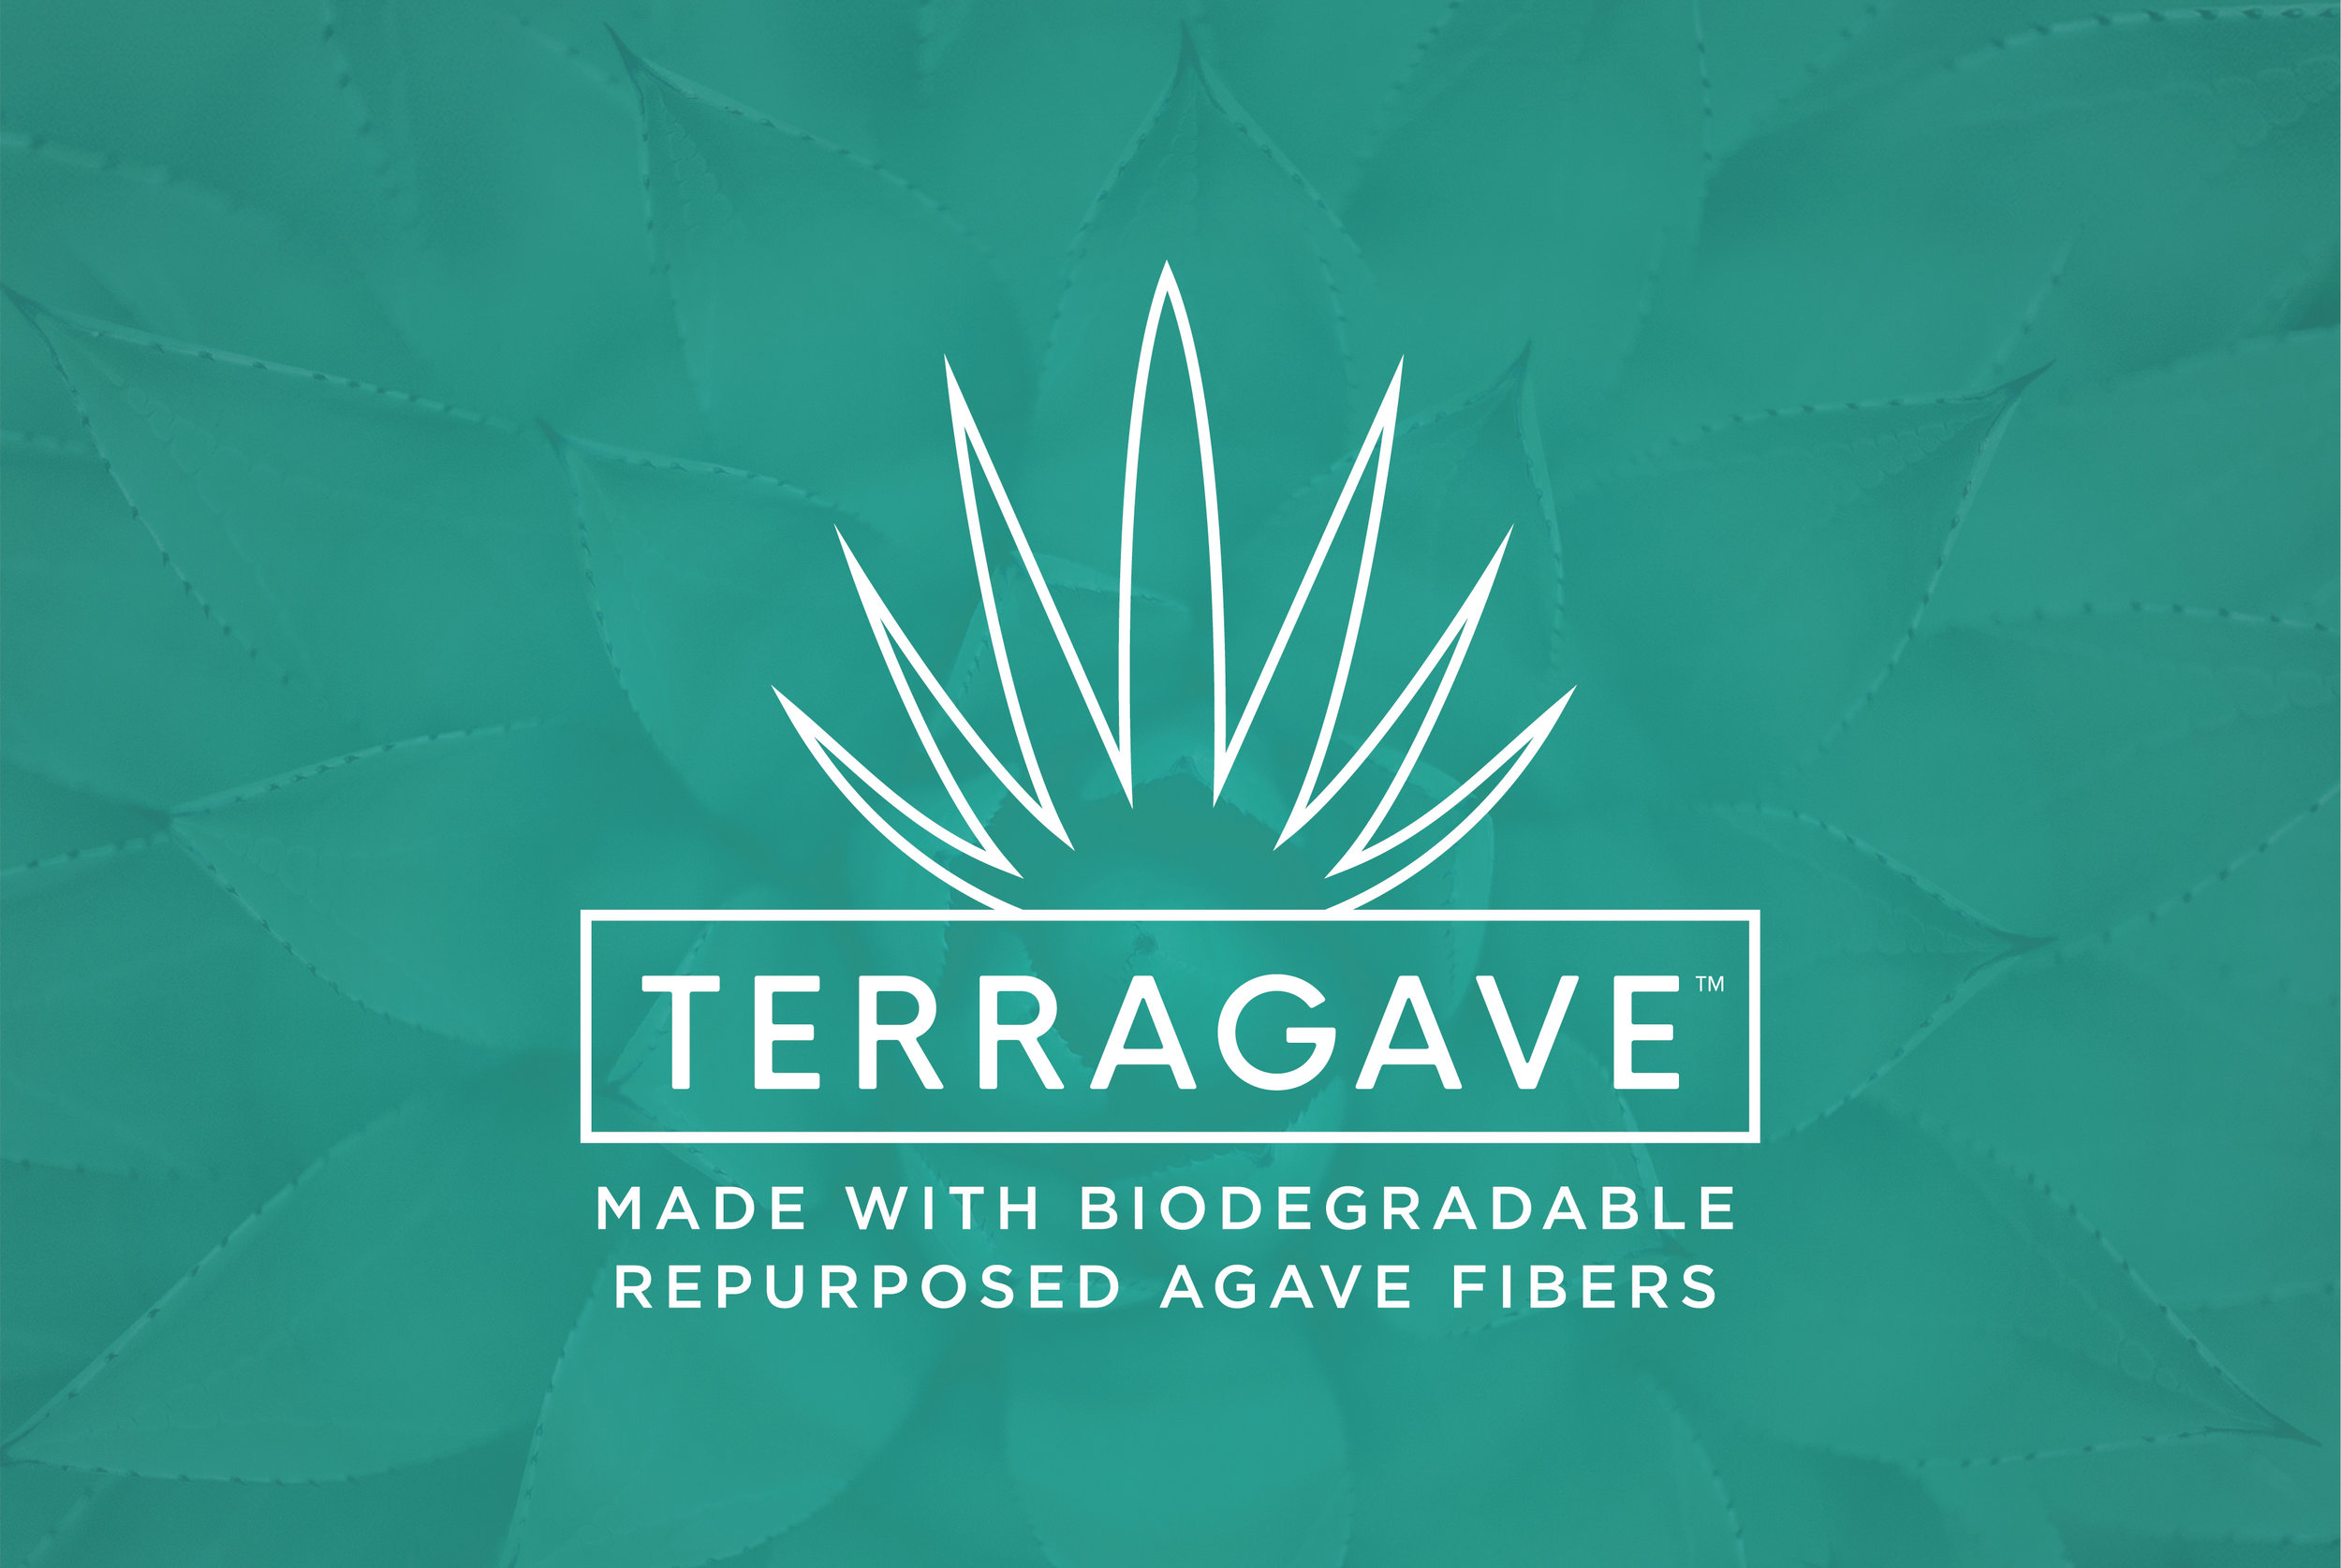 MTQ_Terragave_Web_Slideshow_Graphics_V1_Logo_BackgroundTeal_TM.jpg